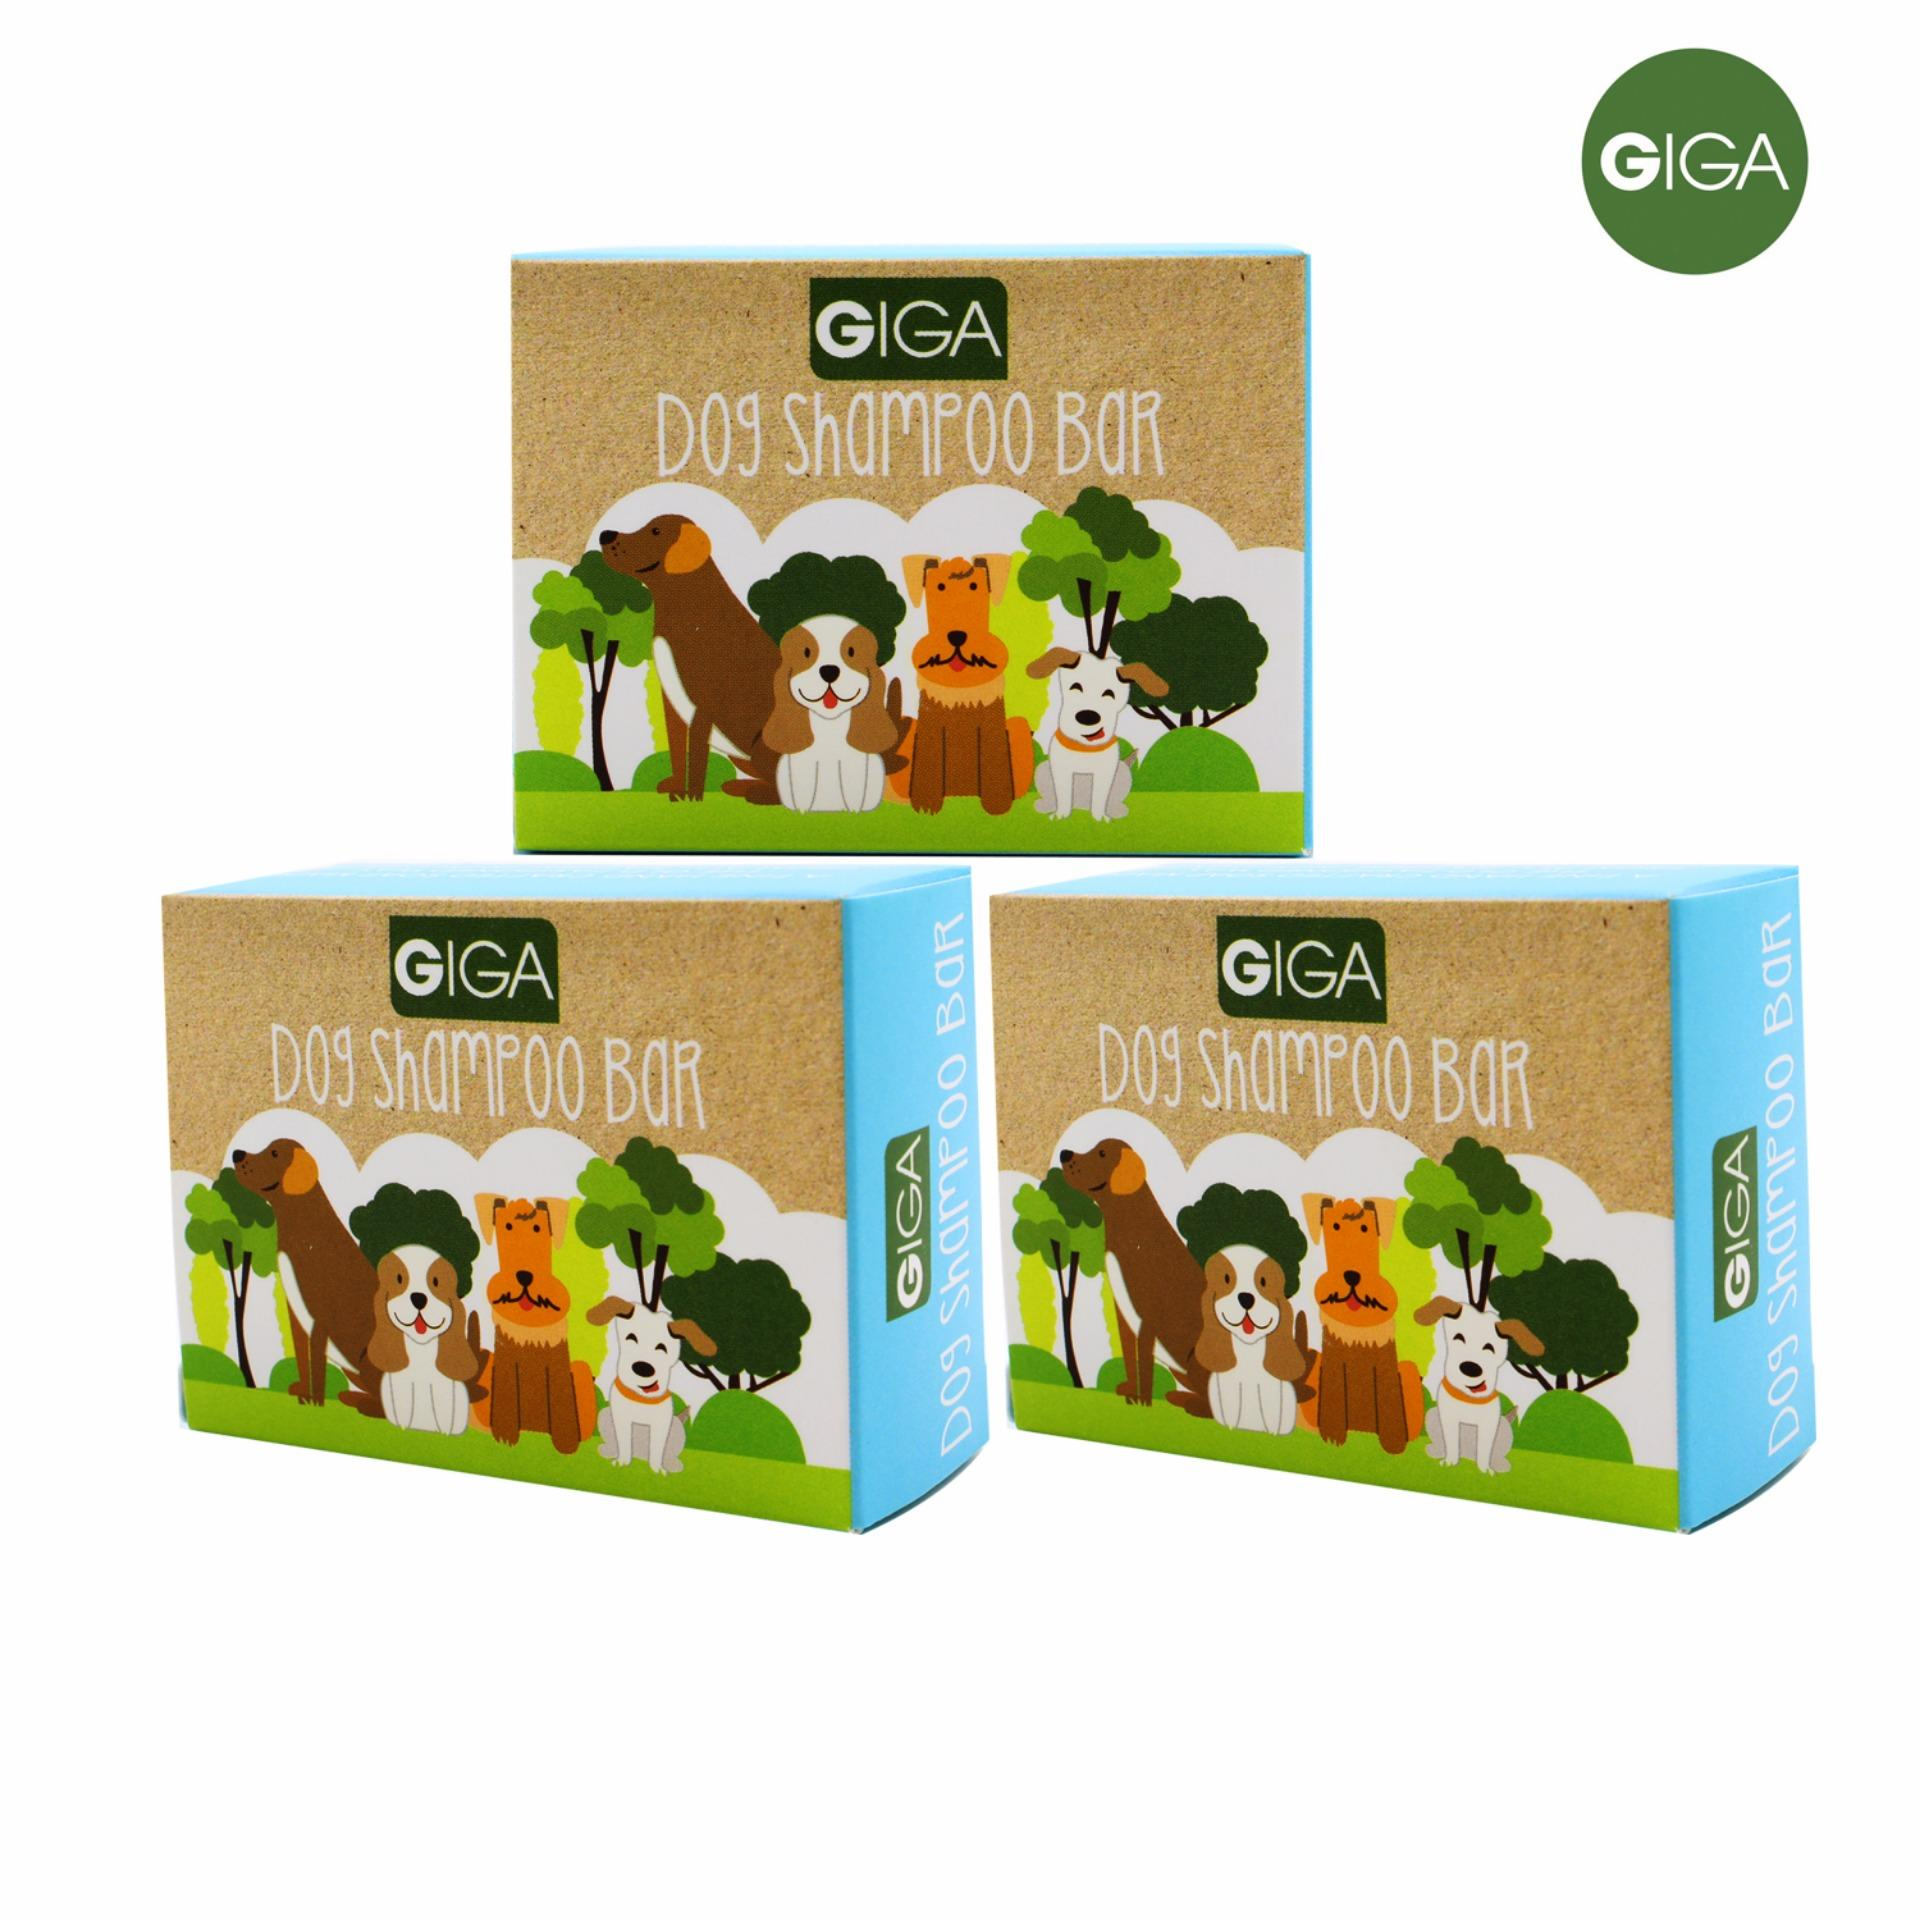 Dog crib for sale philippines - Giga Dog Shampoo Bar 100g Set Of 3